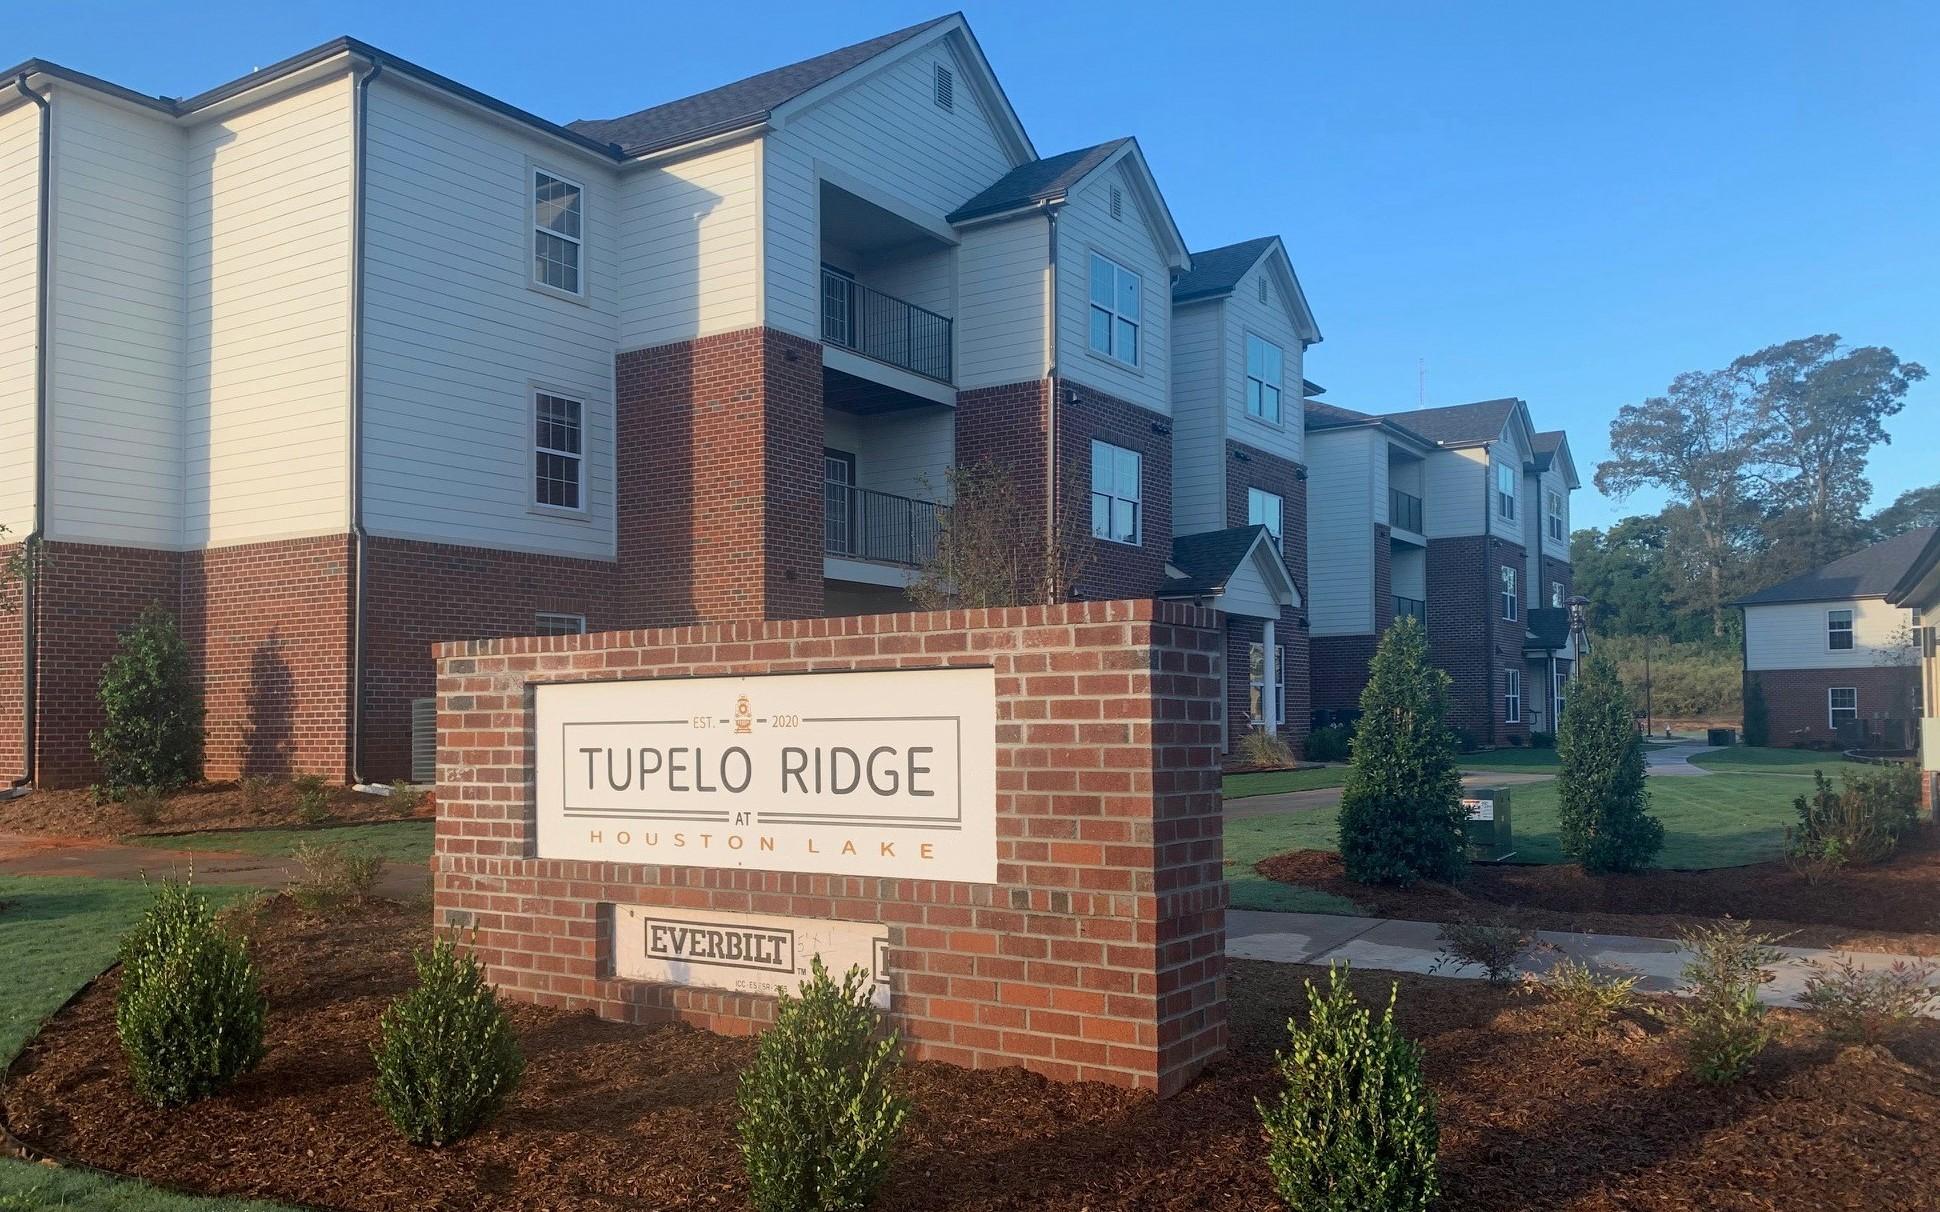 Tupelo Ridge WArner Robbins GA Monument sign